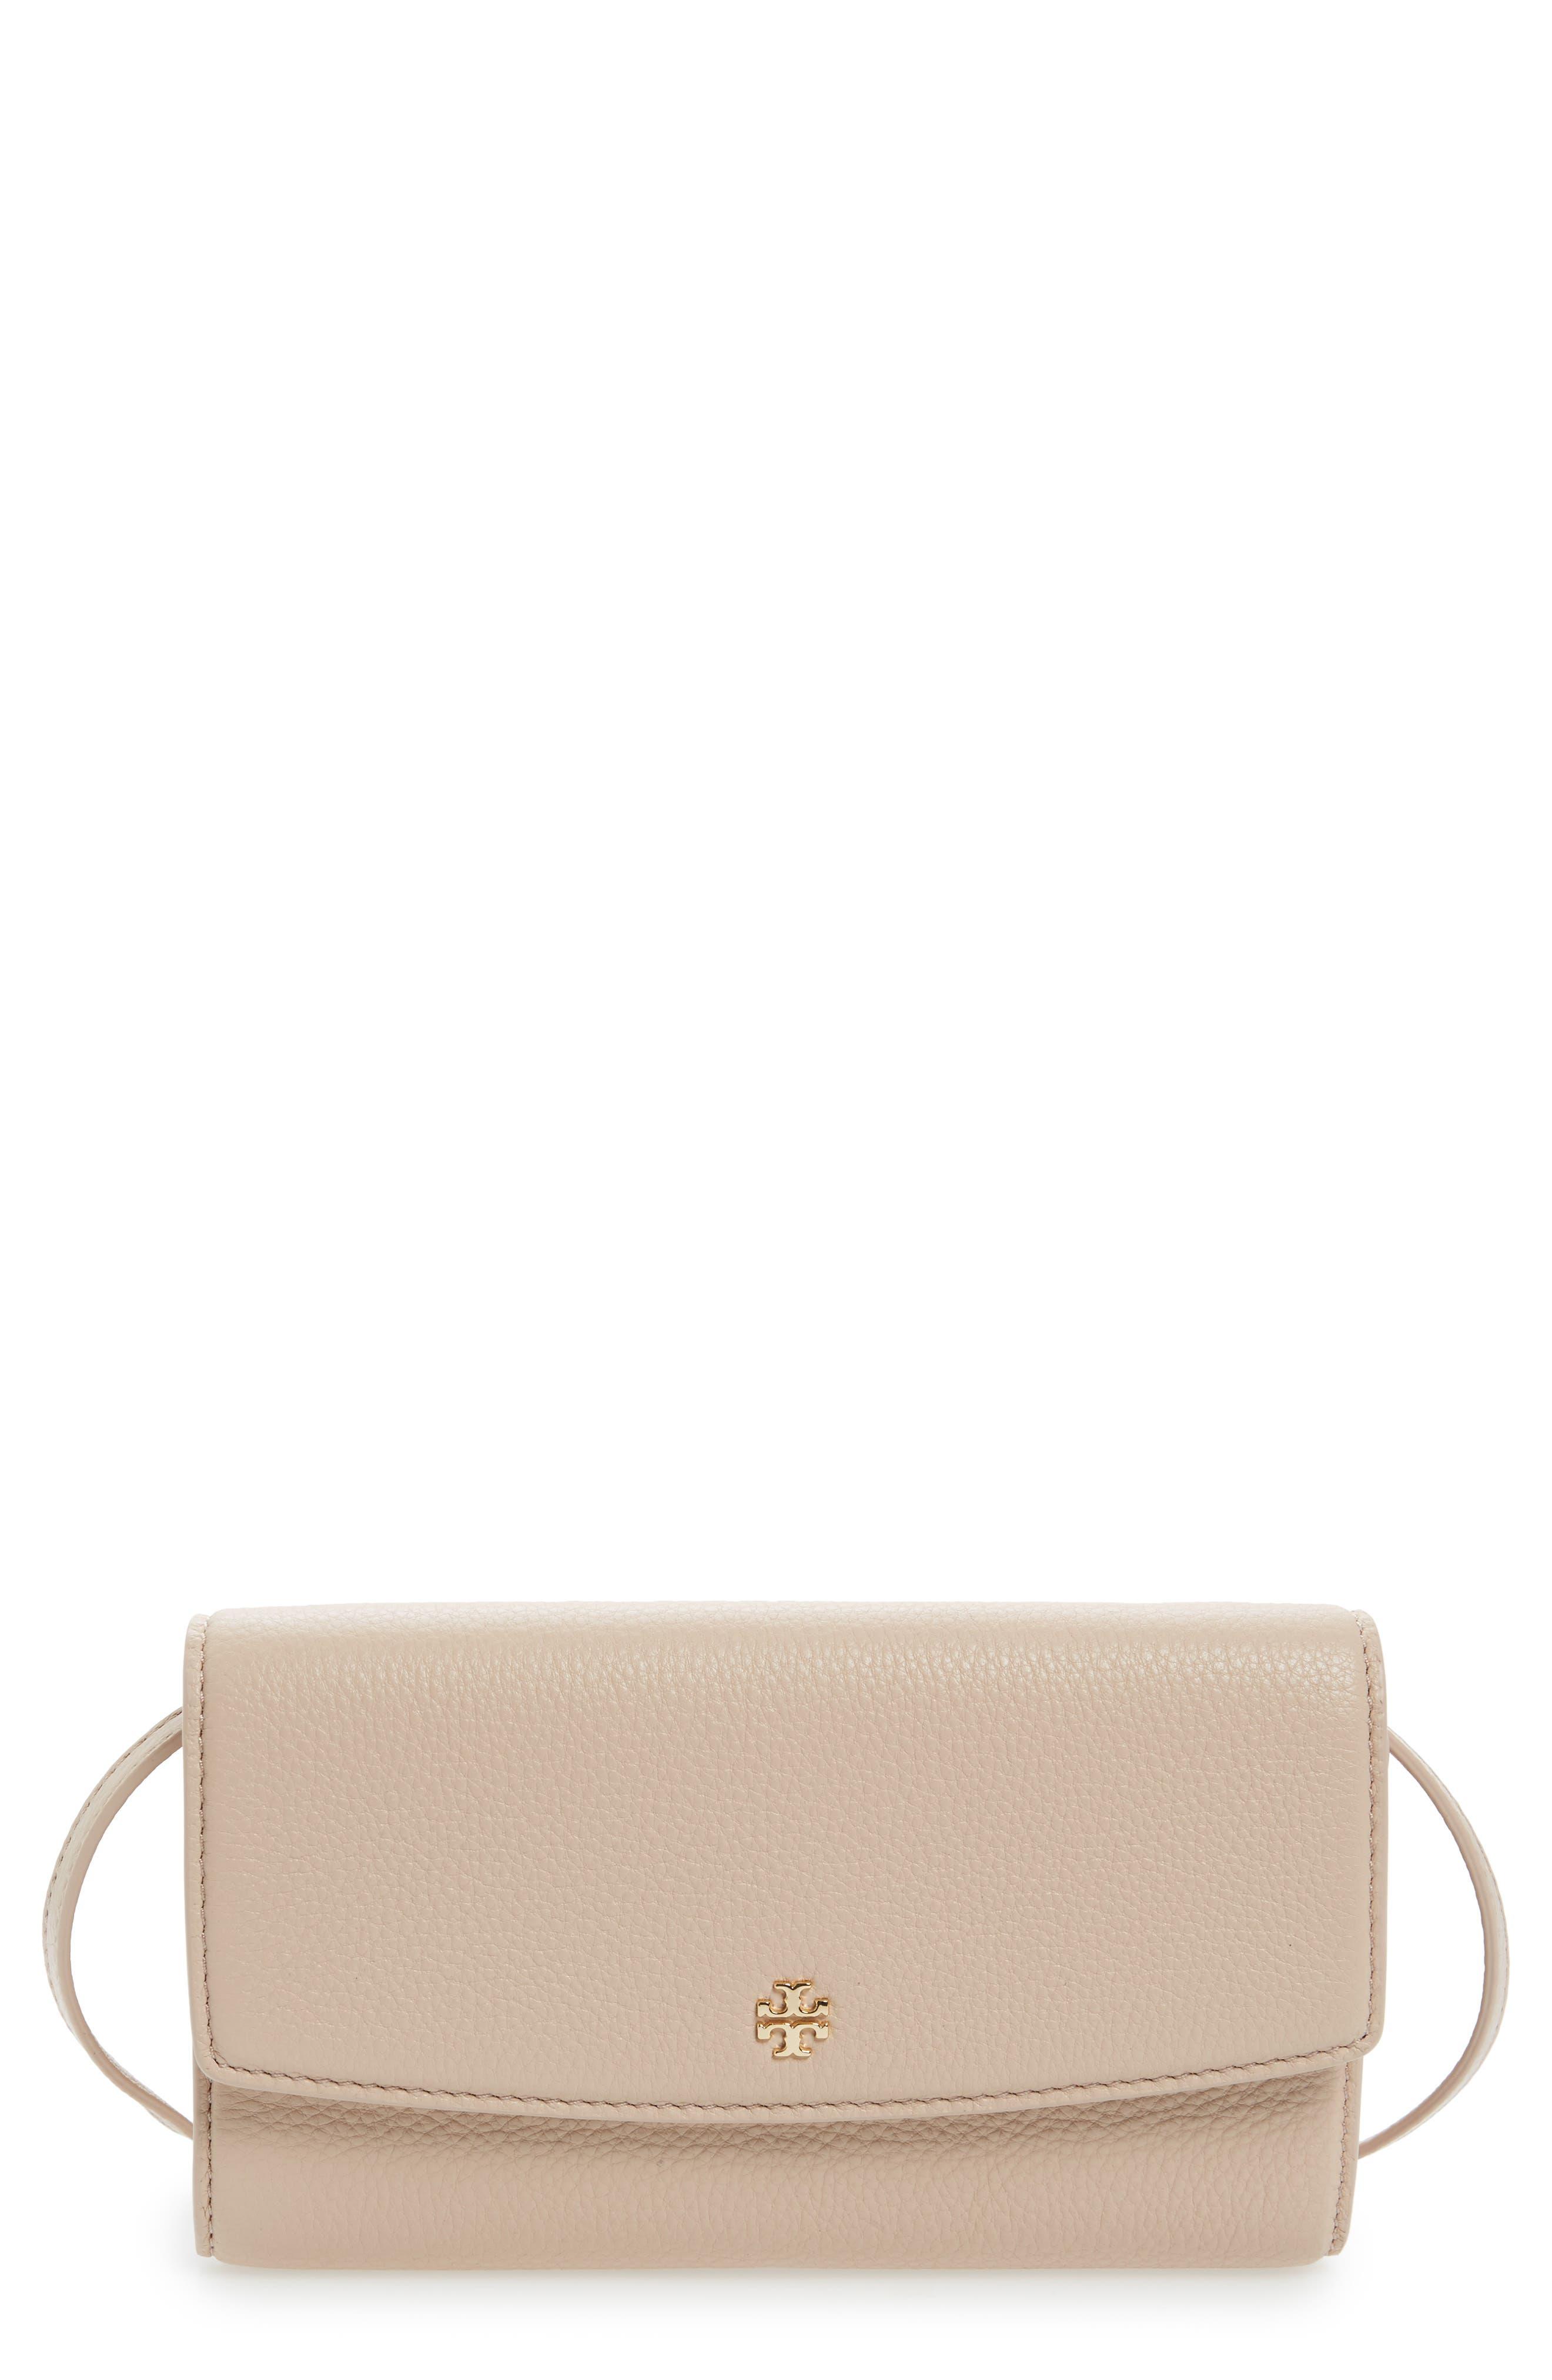 Leather Wallet Crossbody Bag,                         Main,                         color, Light Oak